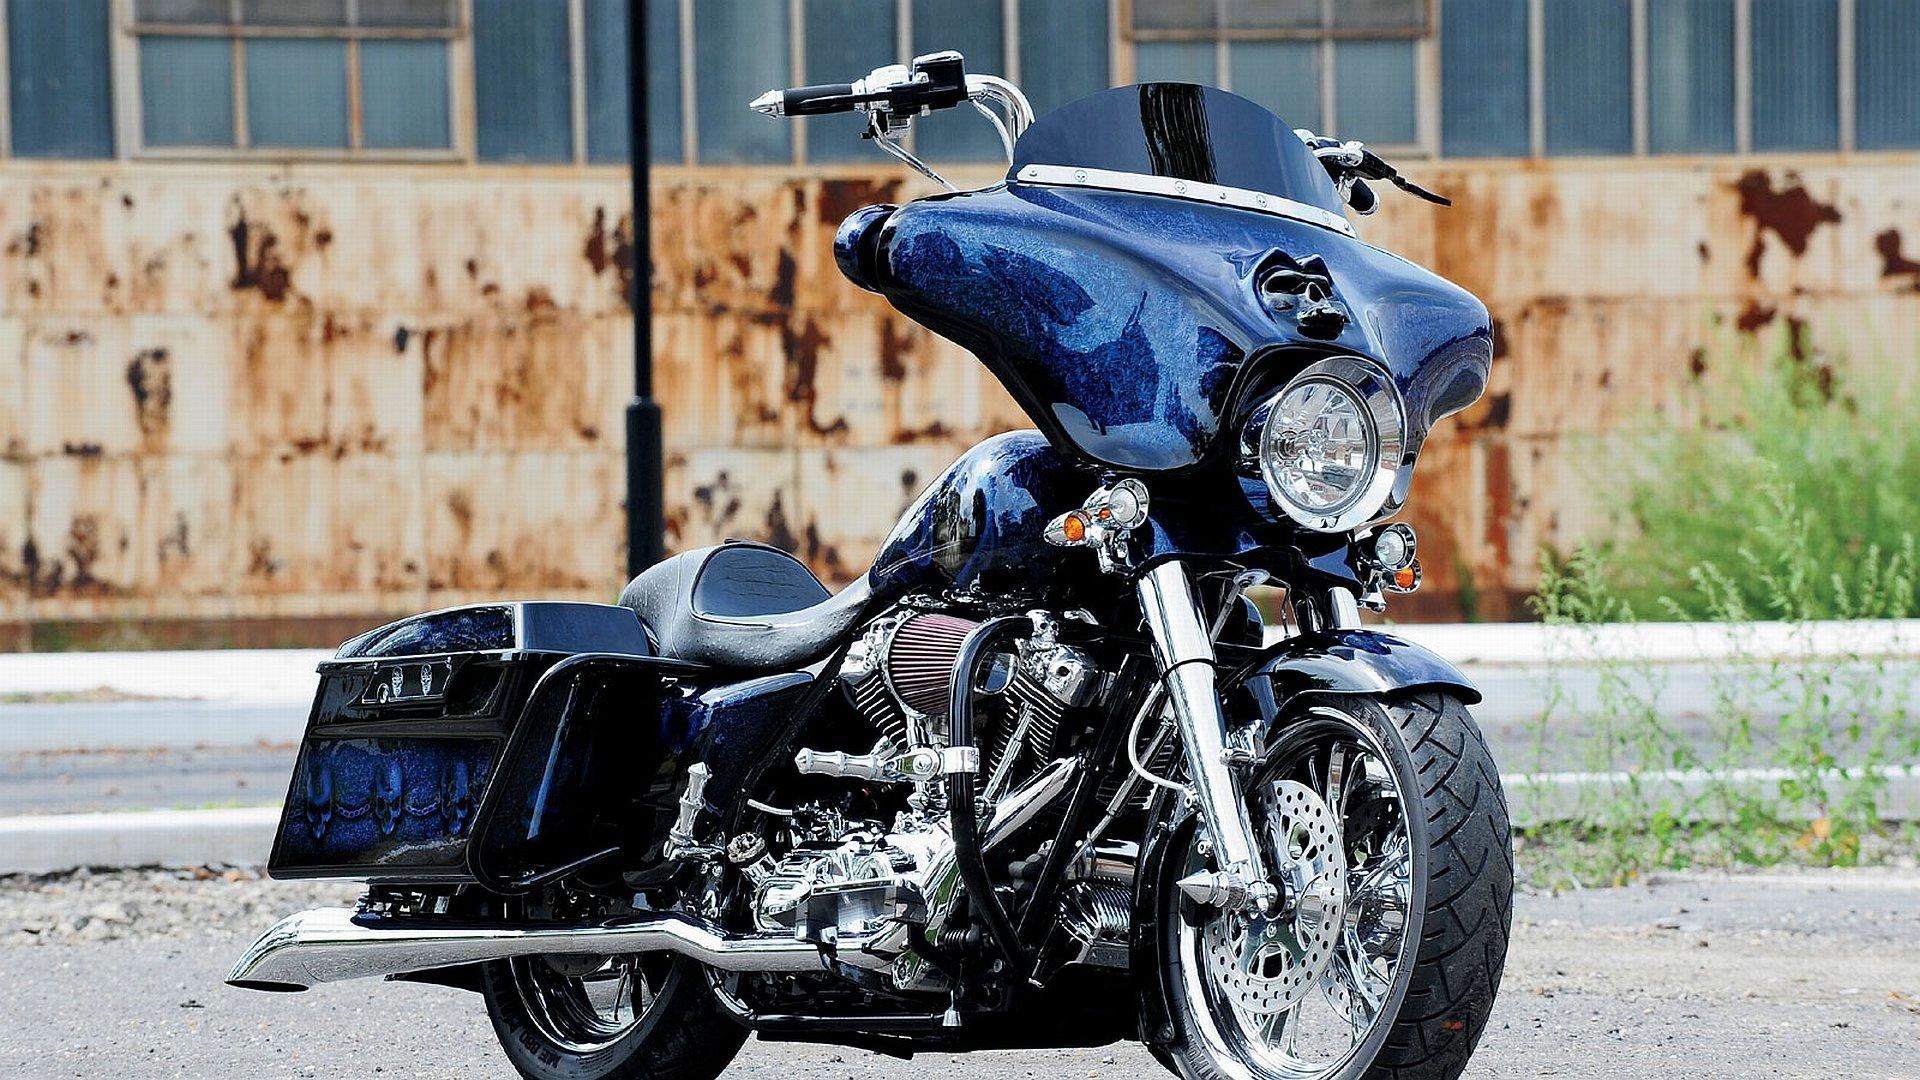 High Resolution Harley Davidson Hd 1080p Background ID:478295 For Desktop